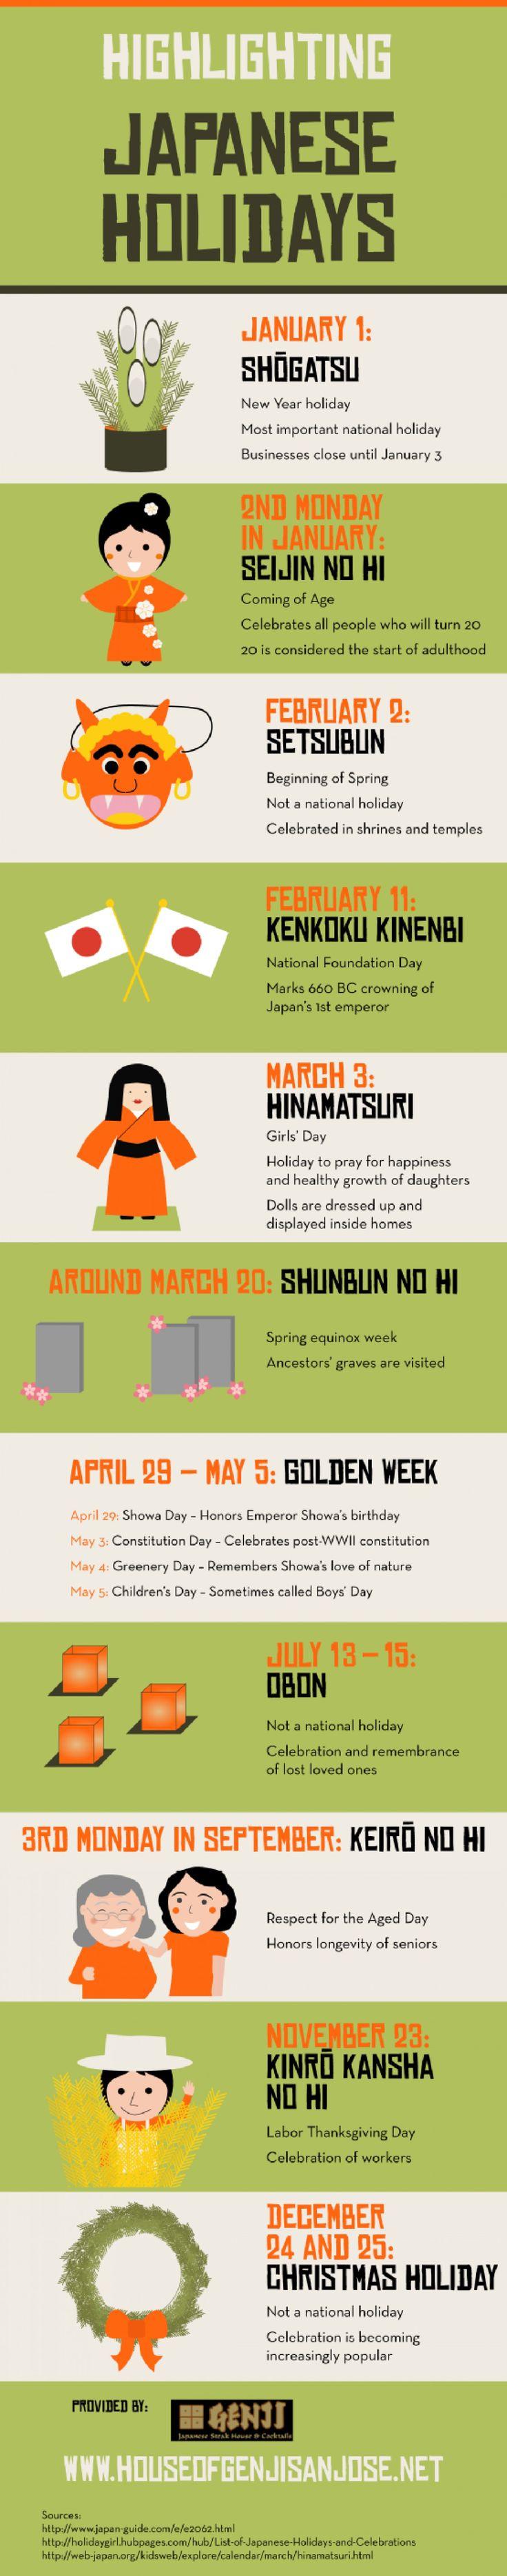 Highlighting Japanese Holidays Infographic